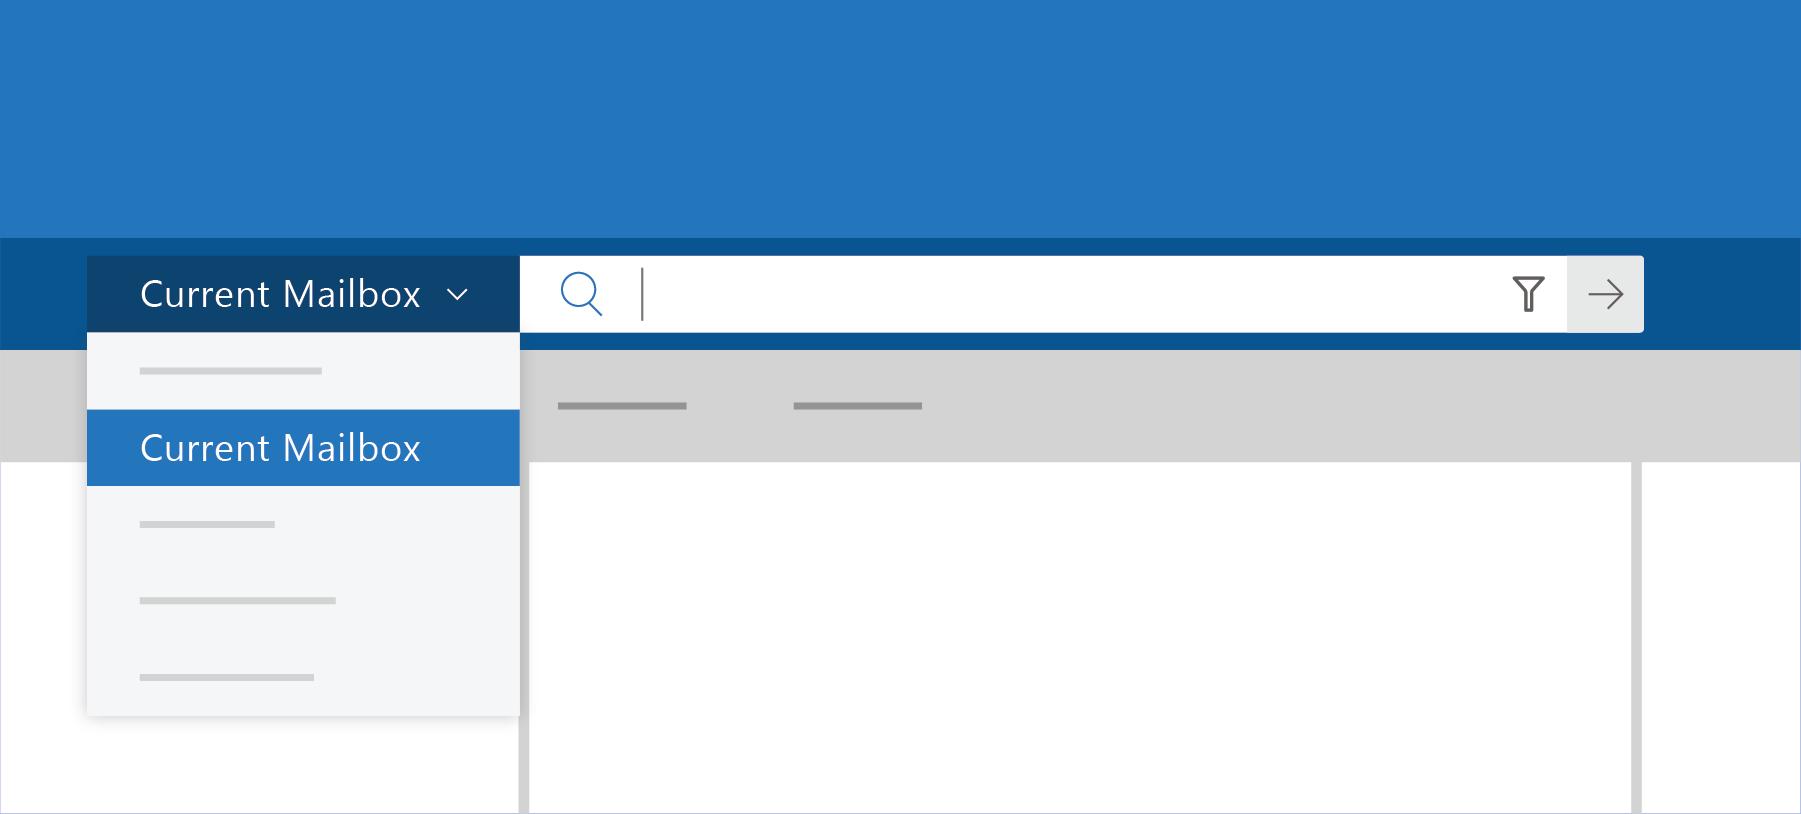 在 Outlook 中顯示搜尋